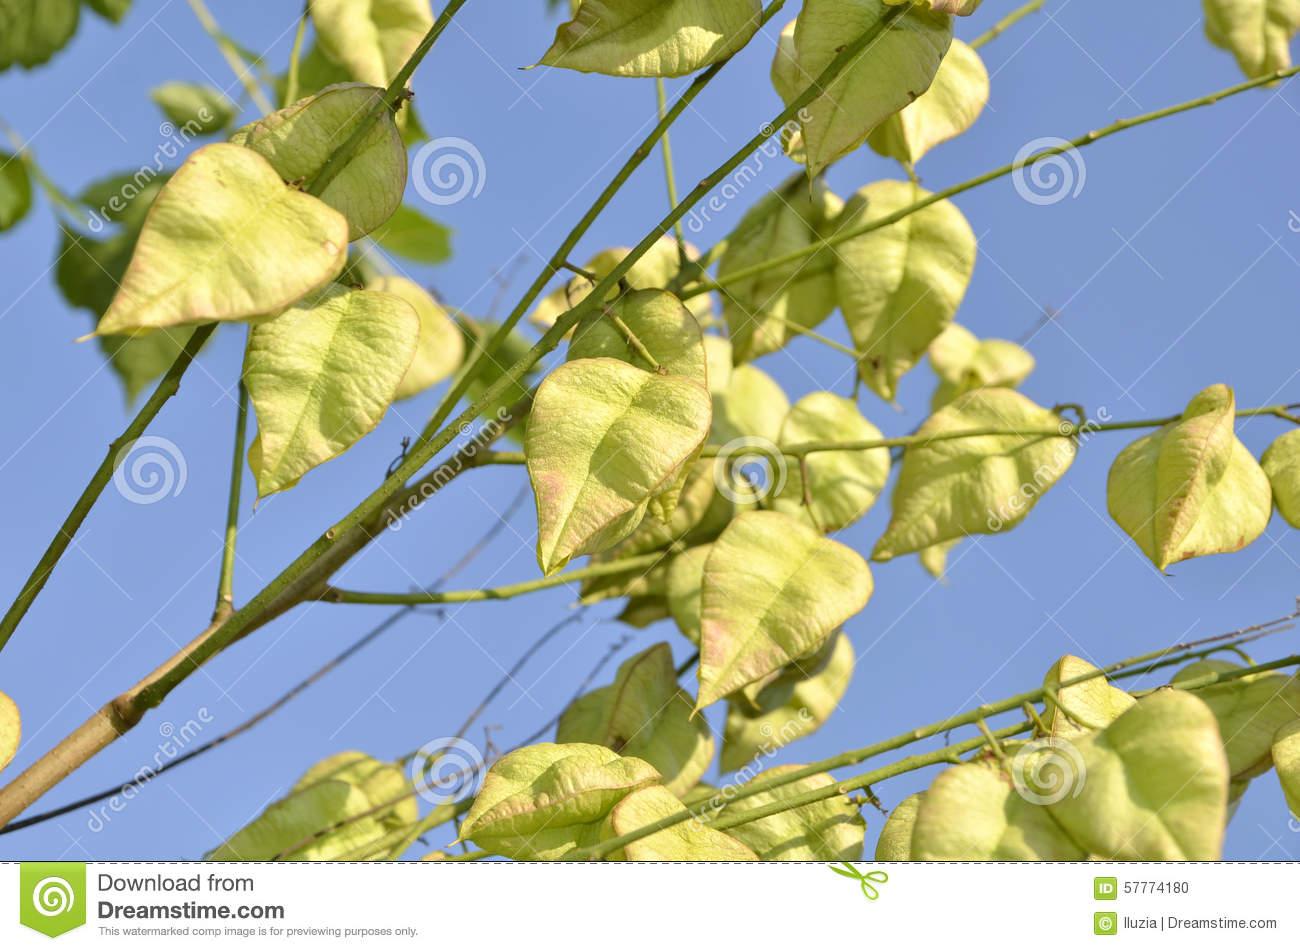 Koelreuteria Paniculata Tree Seed Pods Stock Photo.